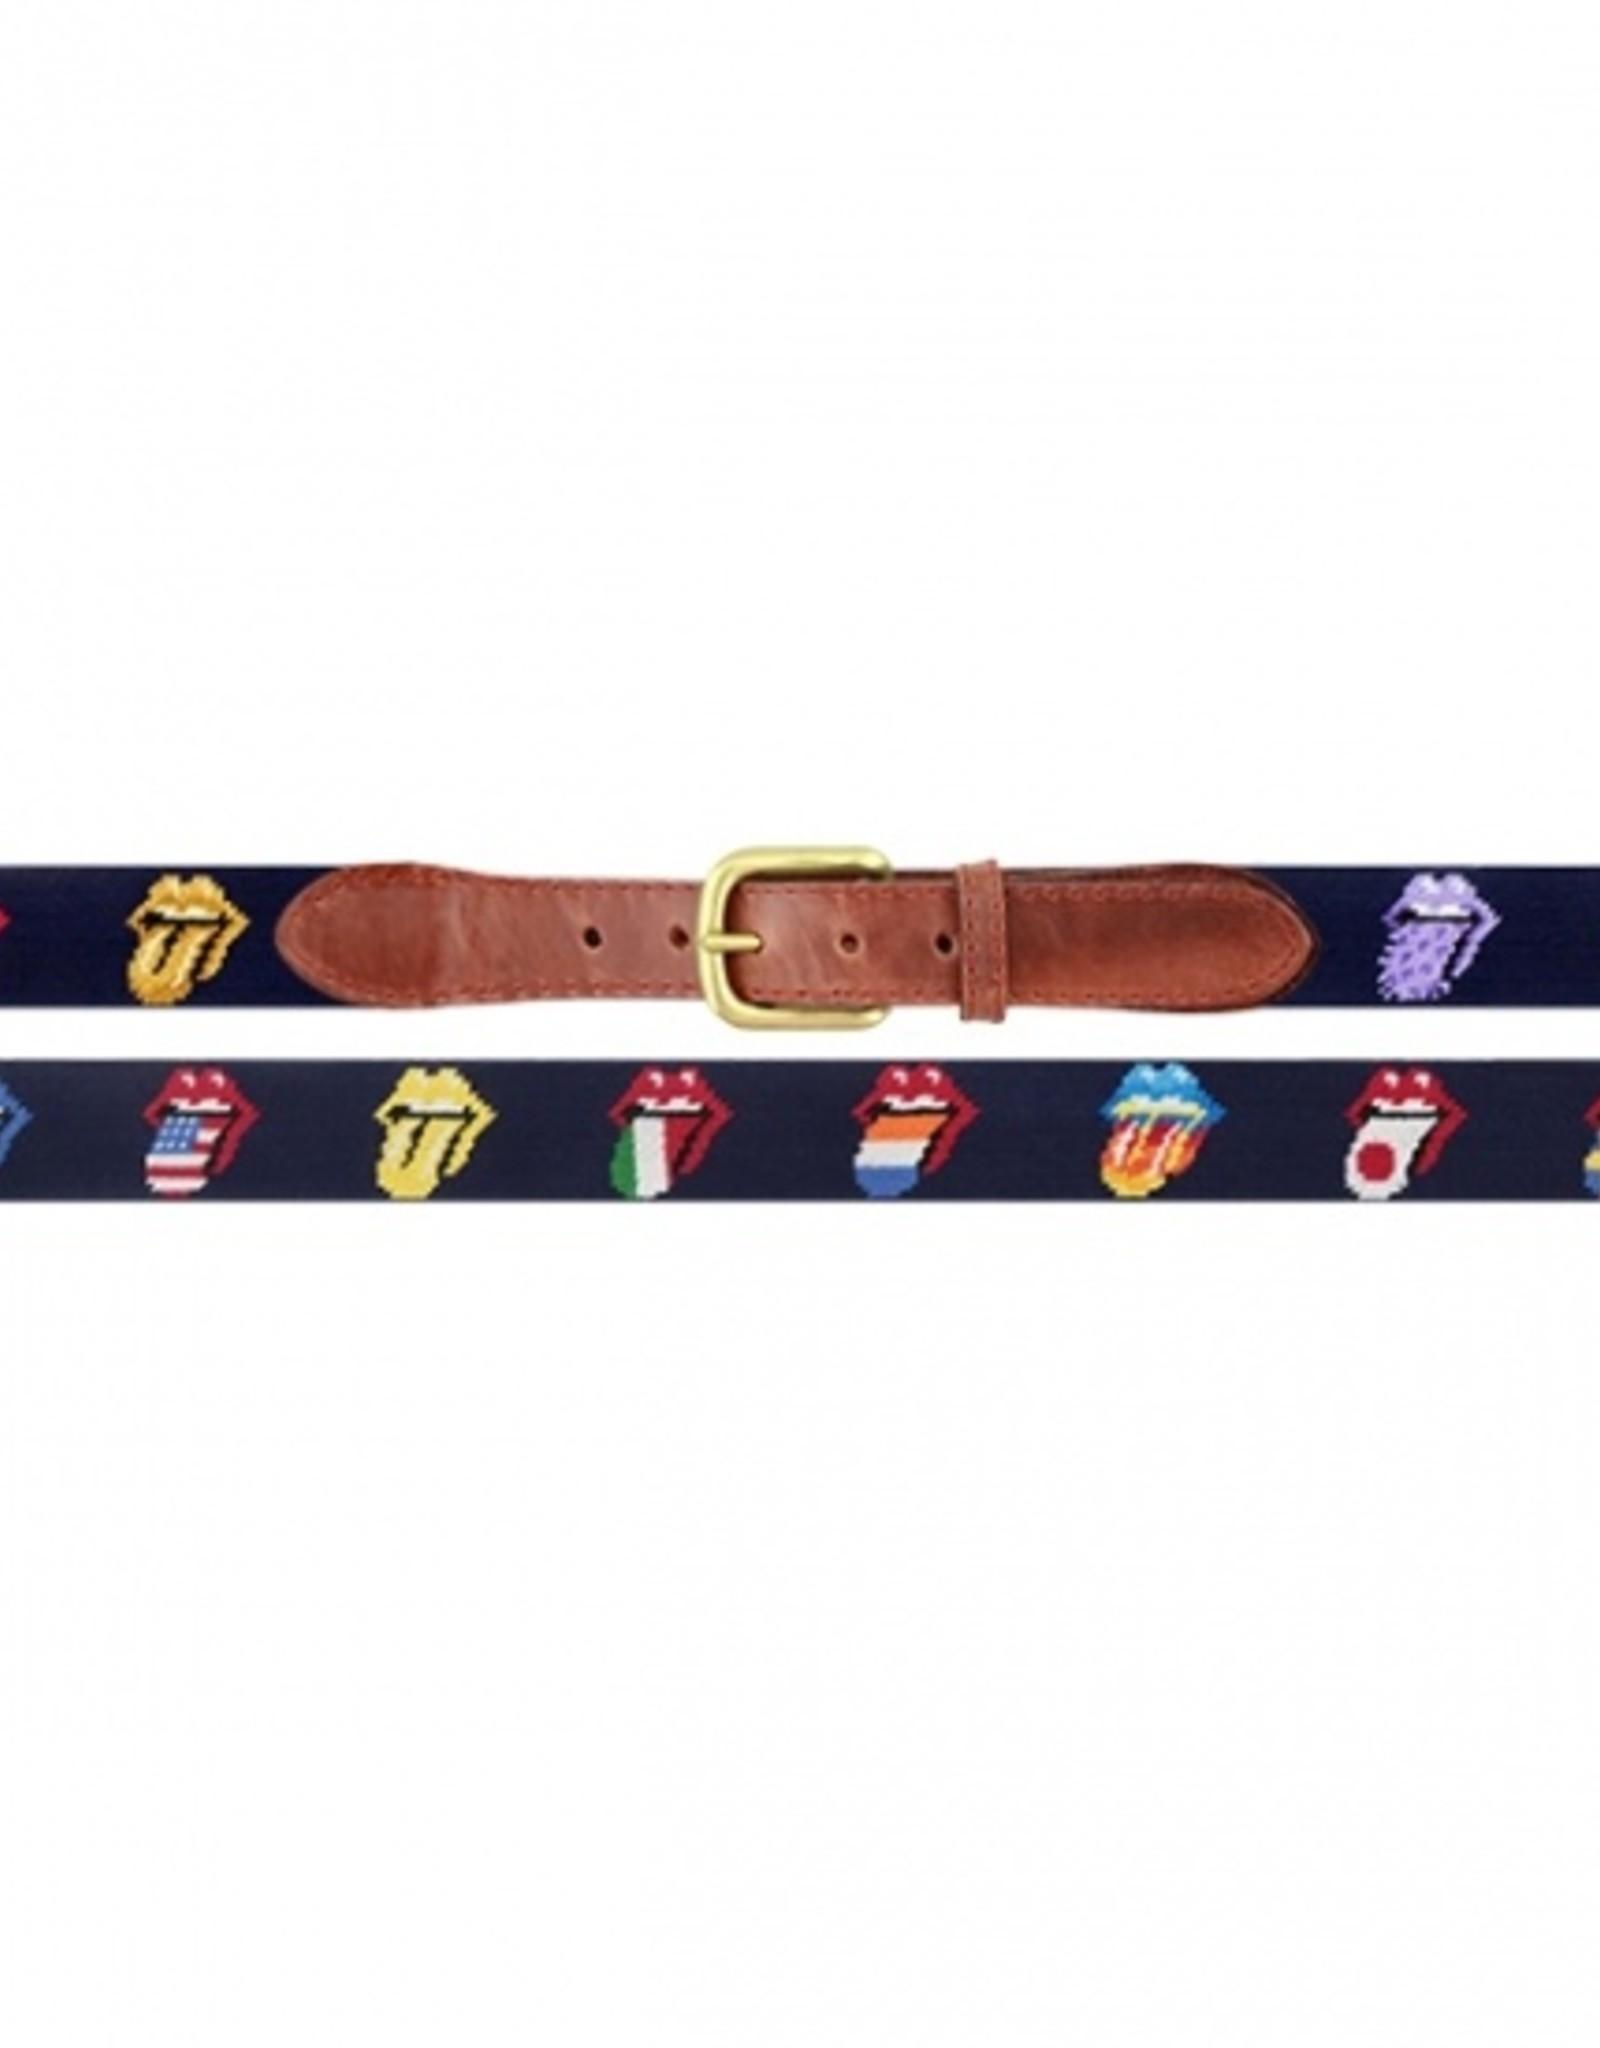 Smathers and Branson Rolling Stones Multi Lick Needlepoint Belt